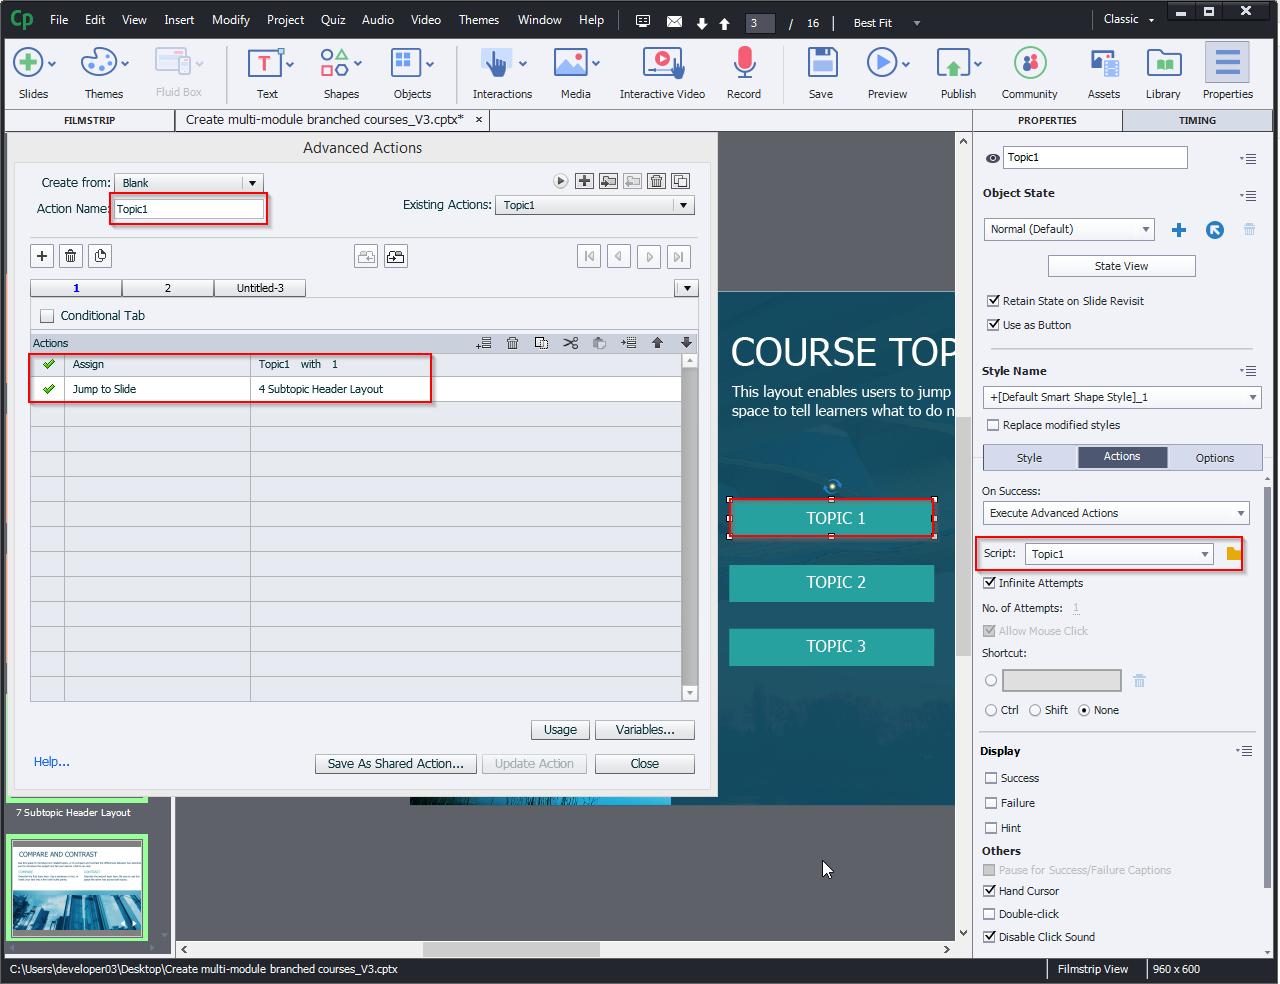 Create multi-module branched courses 10